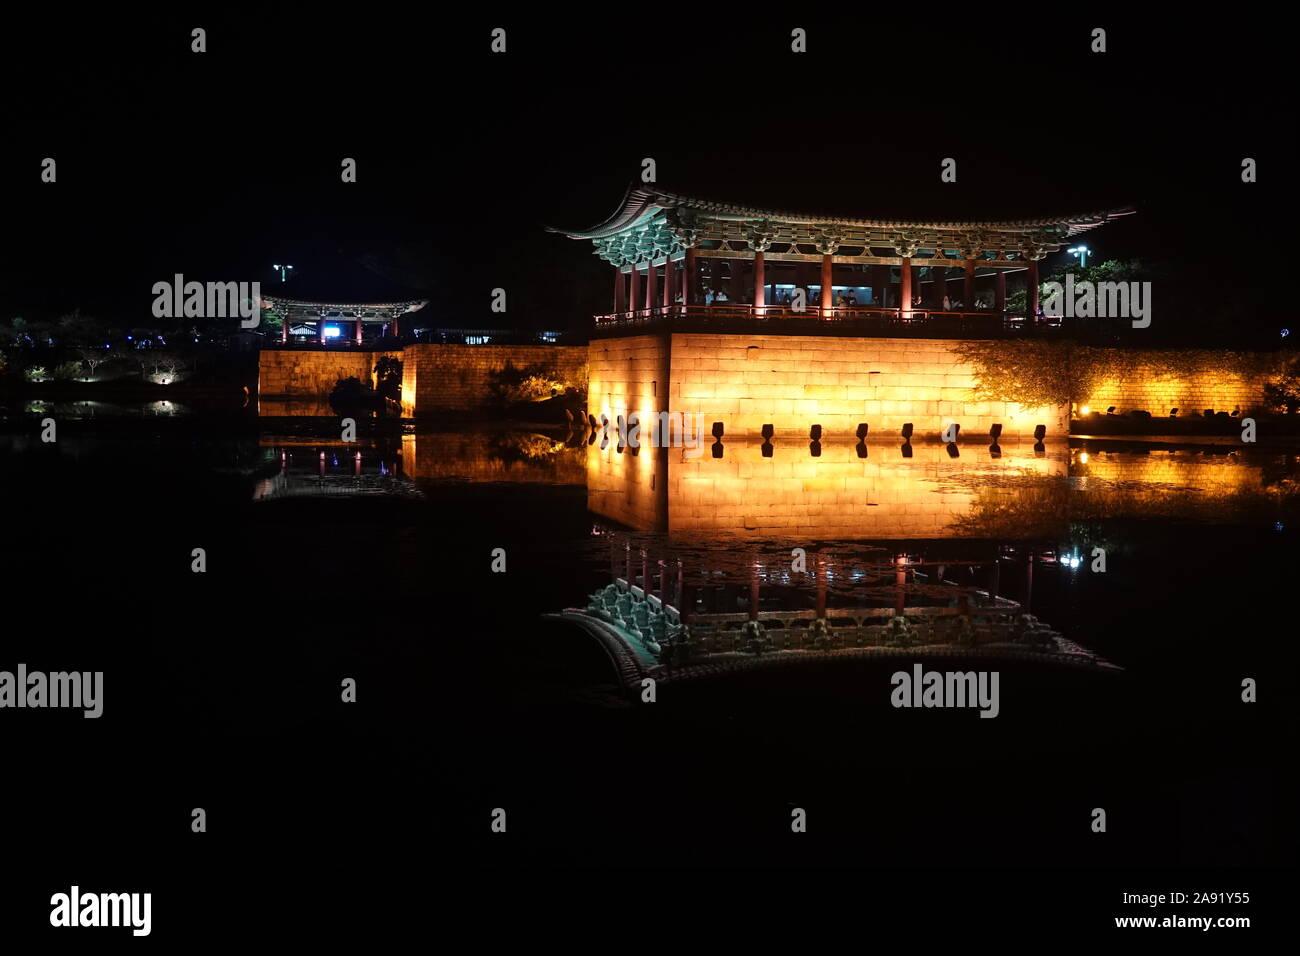 Ahn-ap-ji in Republic of Korea Stock Photo